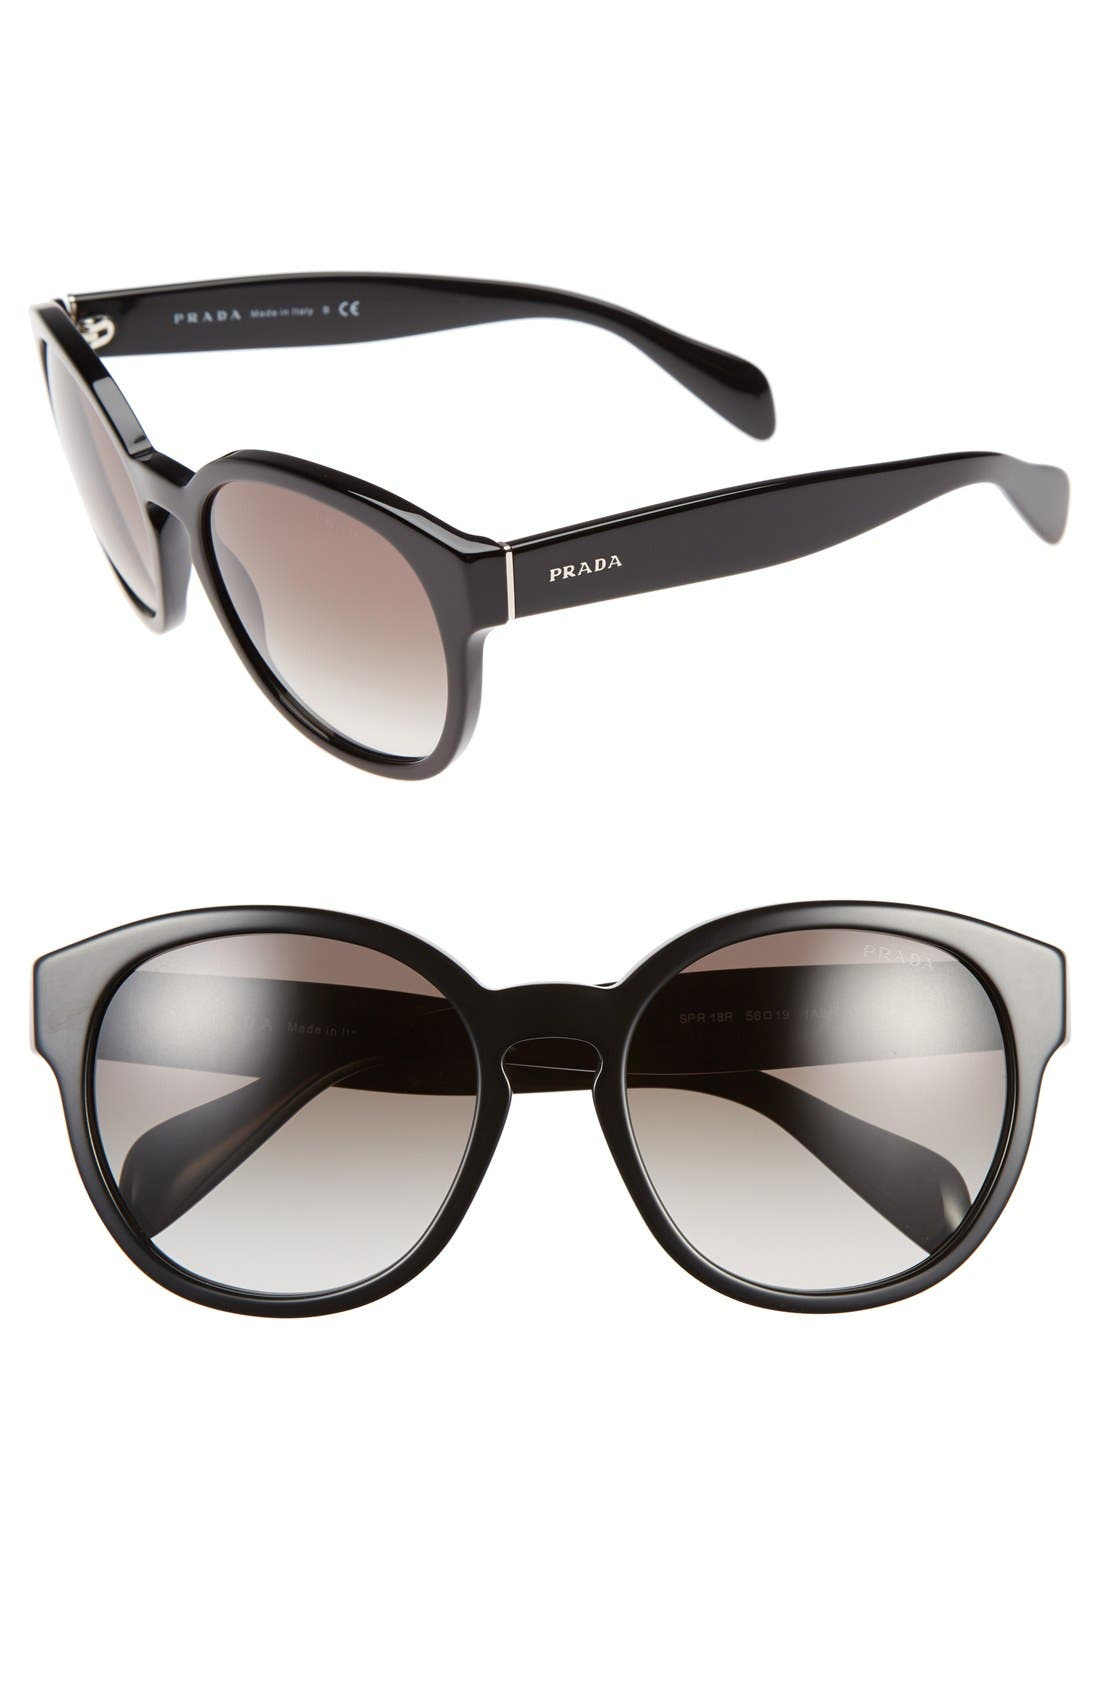 Main Image - Prada 56mm Keyhole Sunglasses